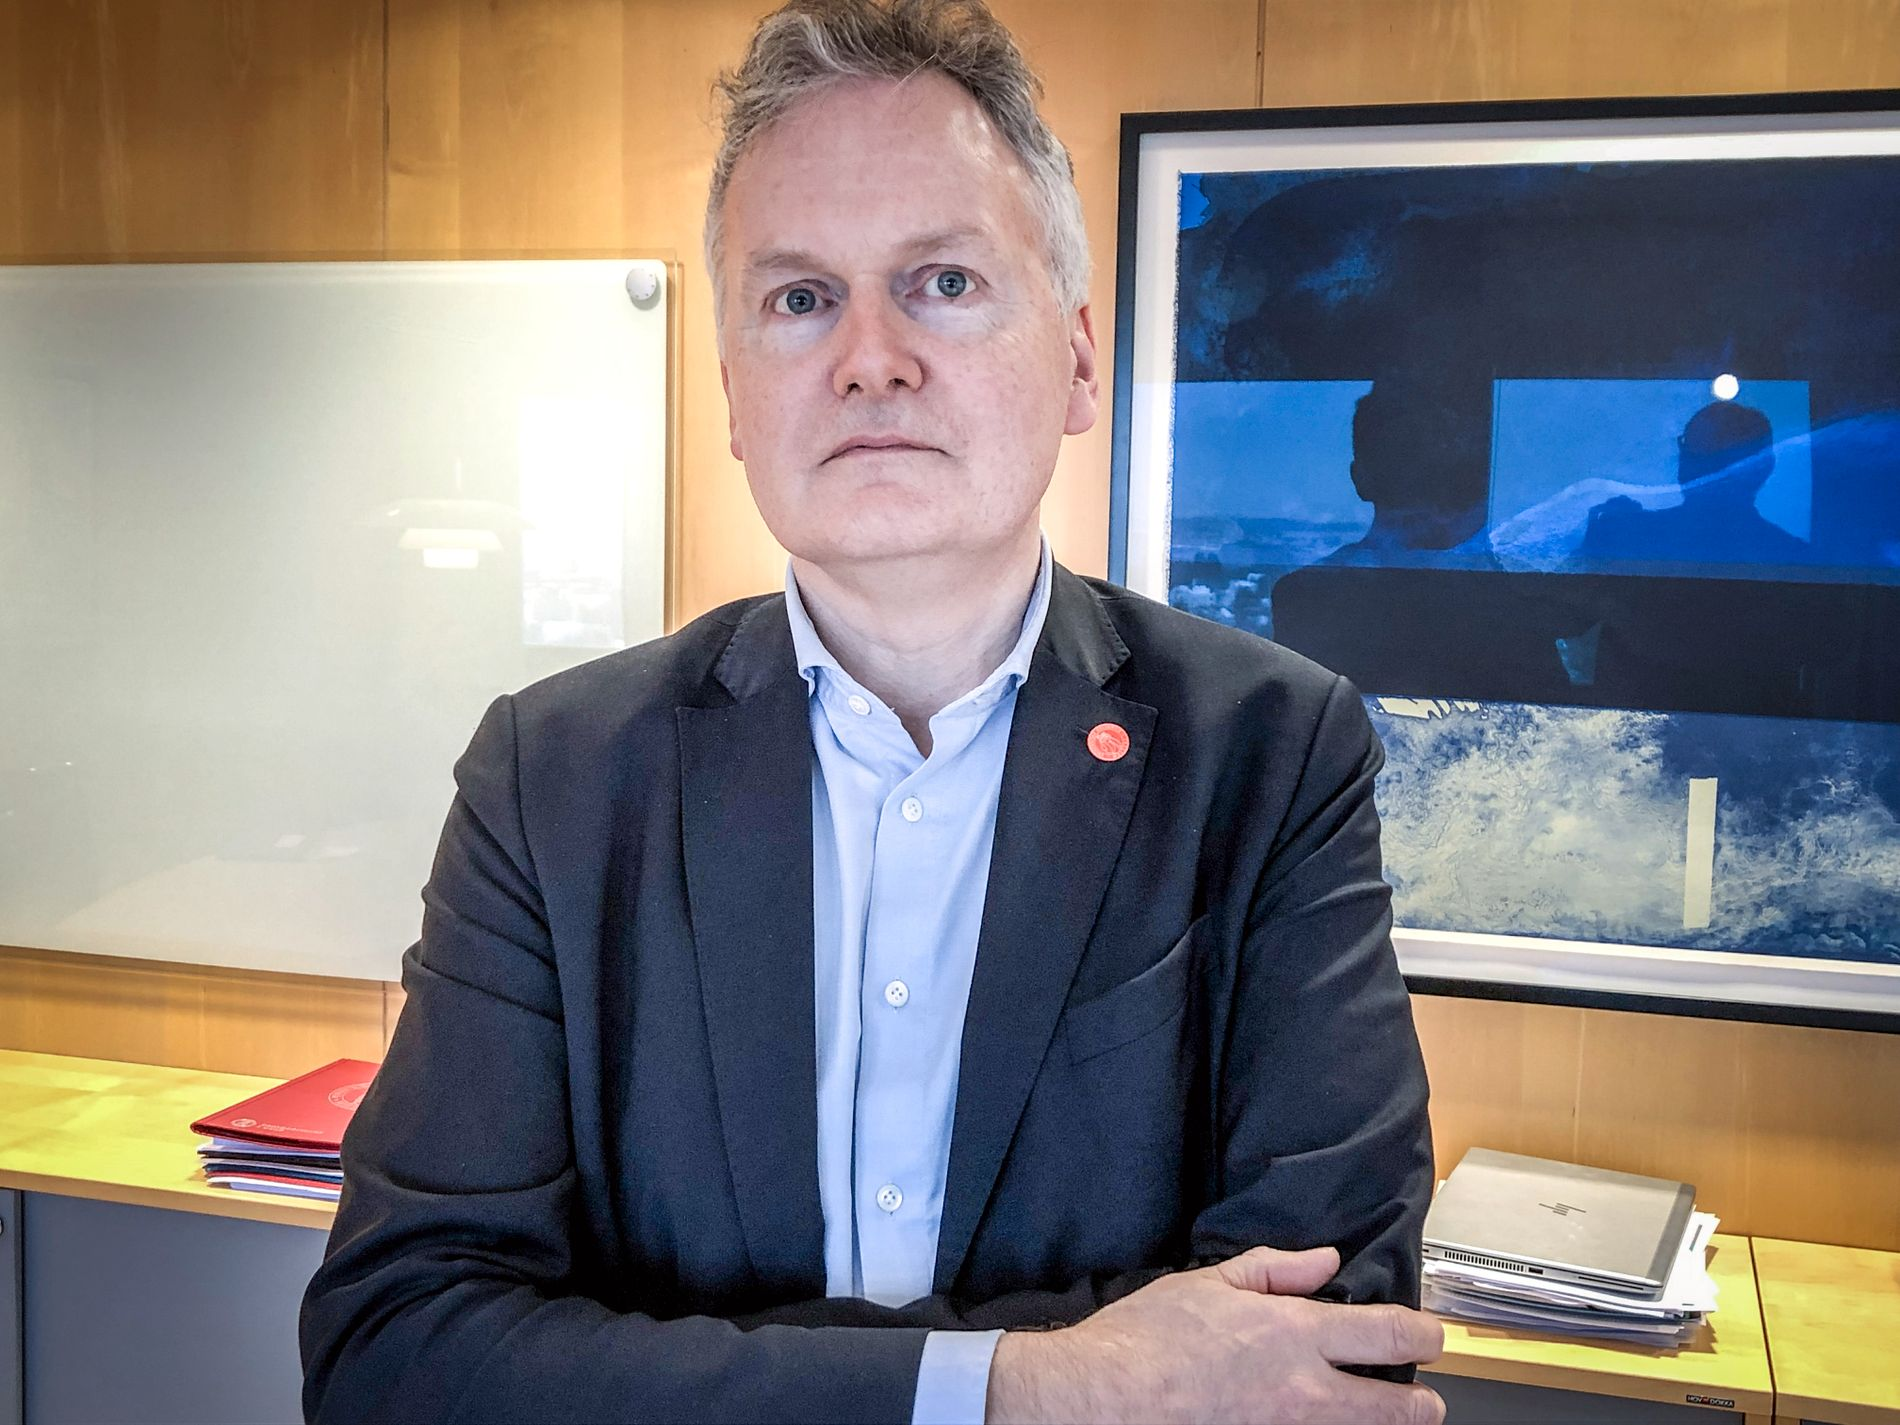 SVARER SKRIFTLIG: UiO-direktør Arne Benjaminsen.